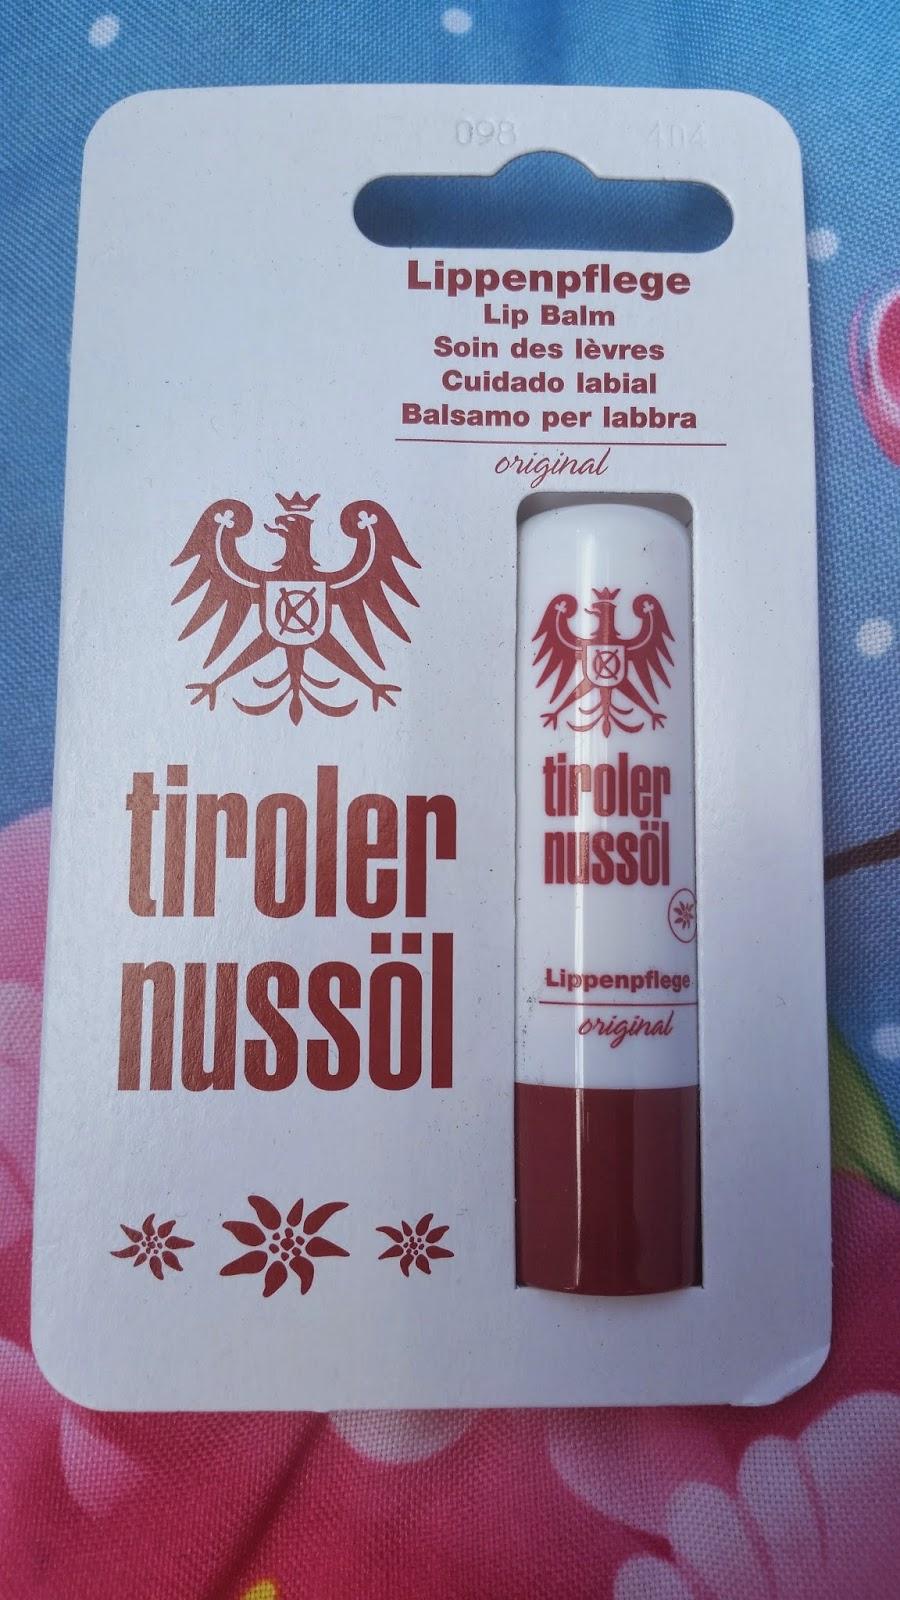 Tiroler Nussöl - Original Lippenpflege - www.annitschkasblog.de